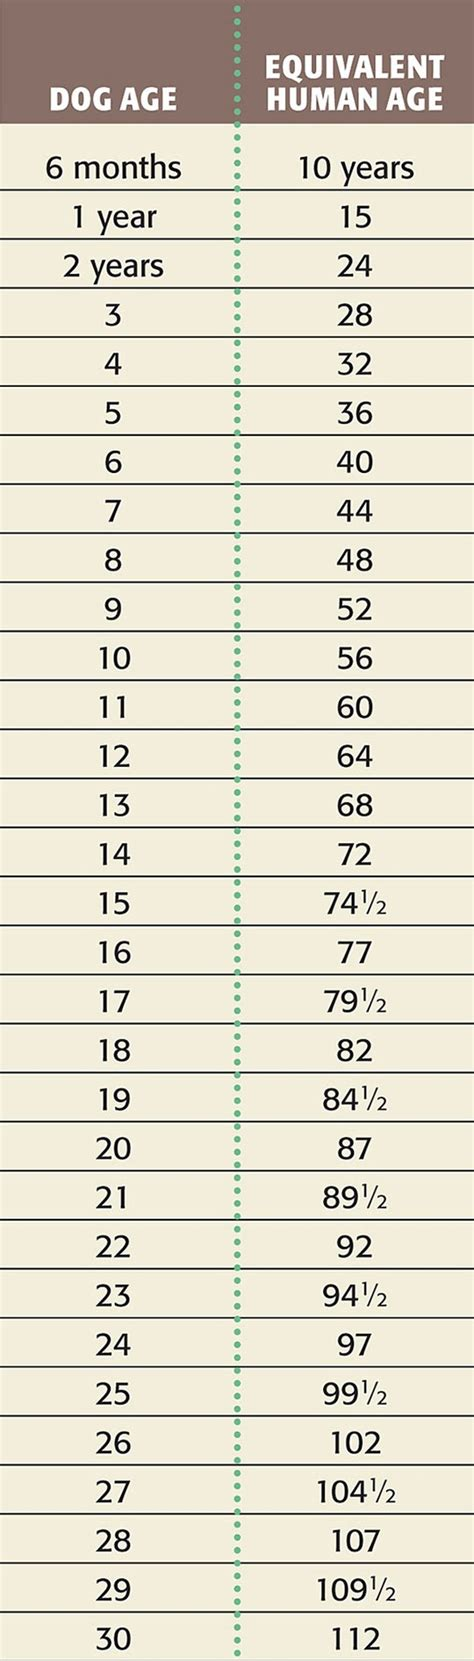 age to human age age vs human age